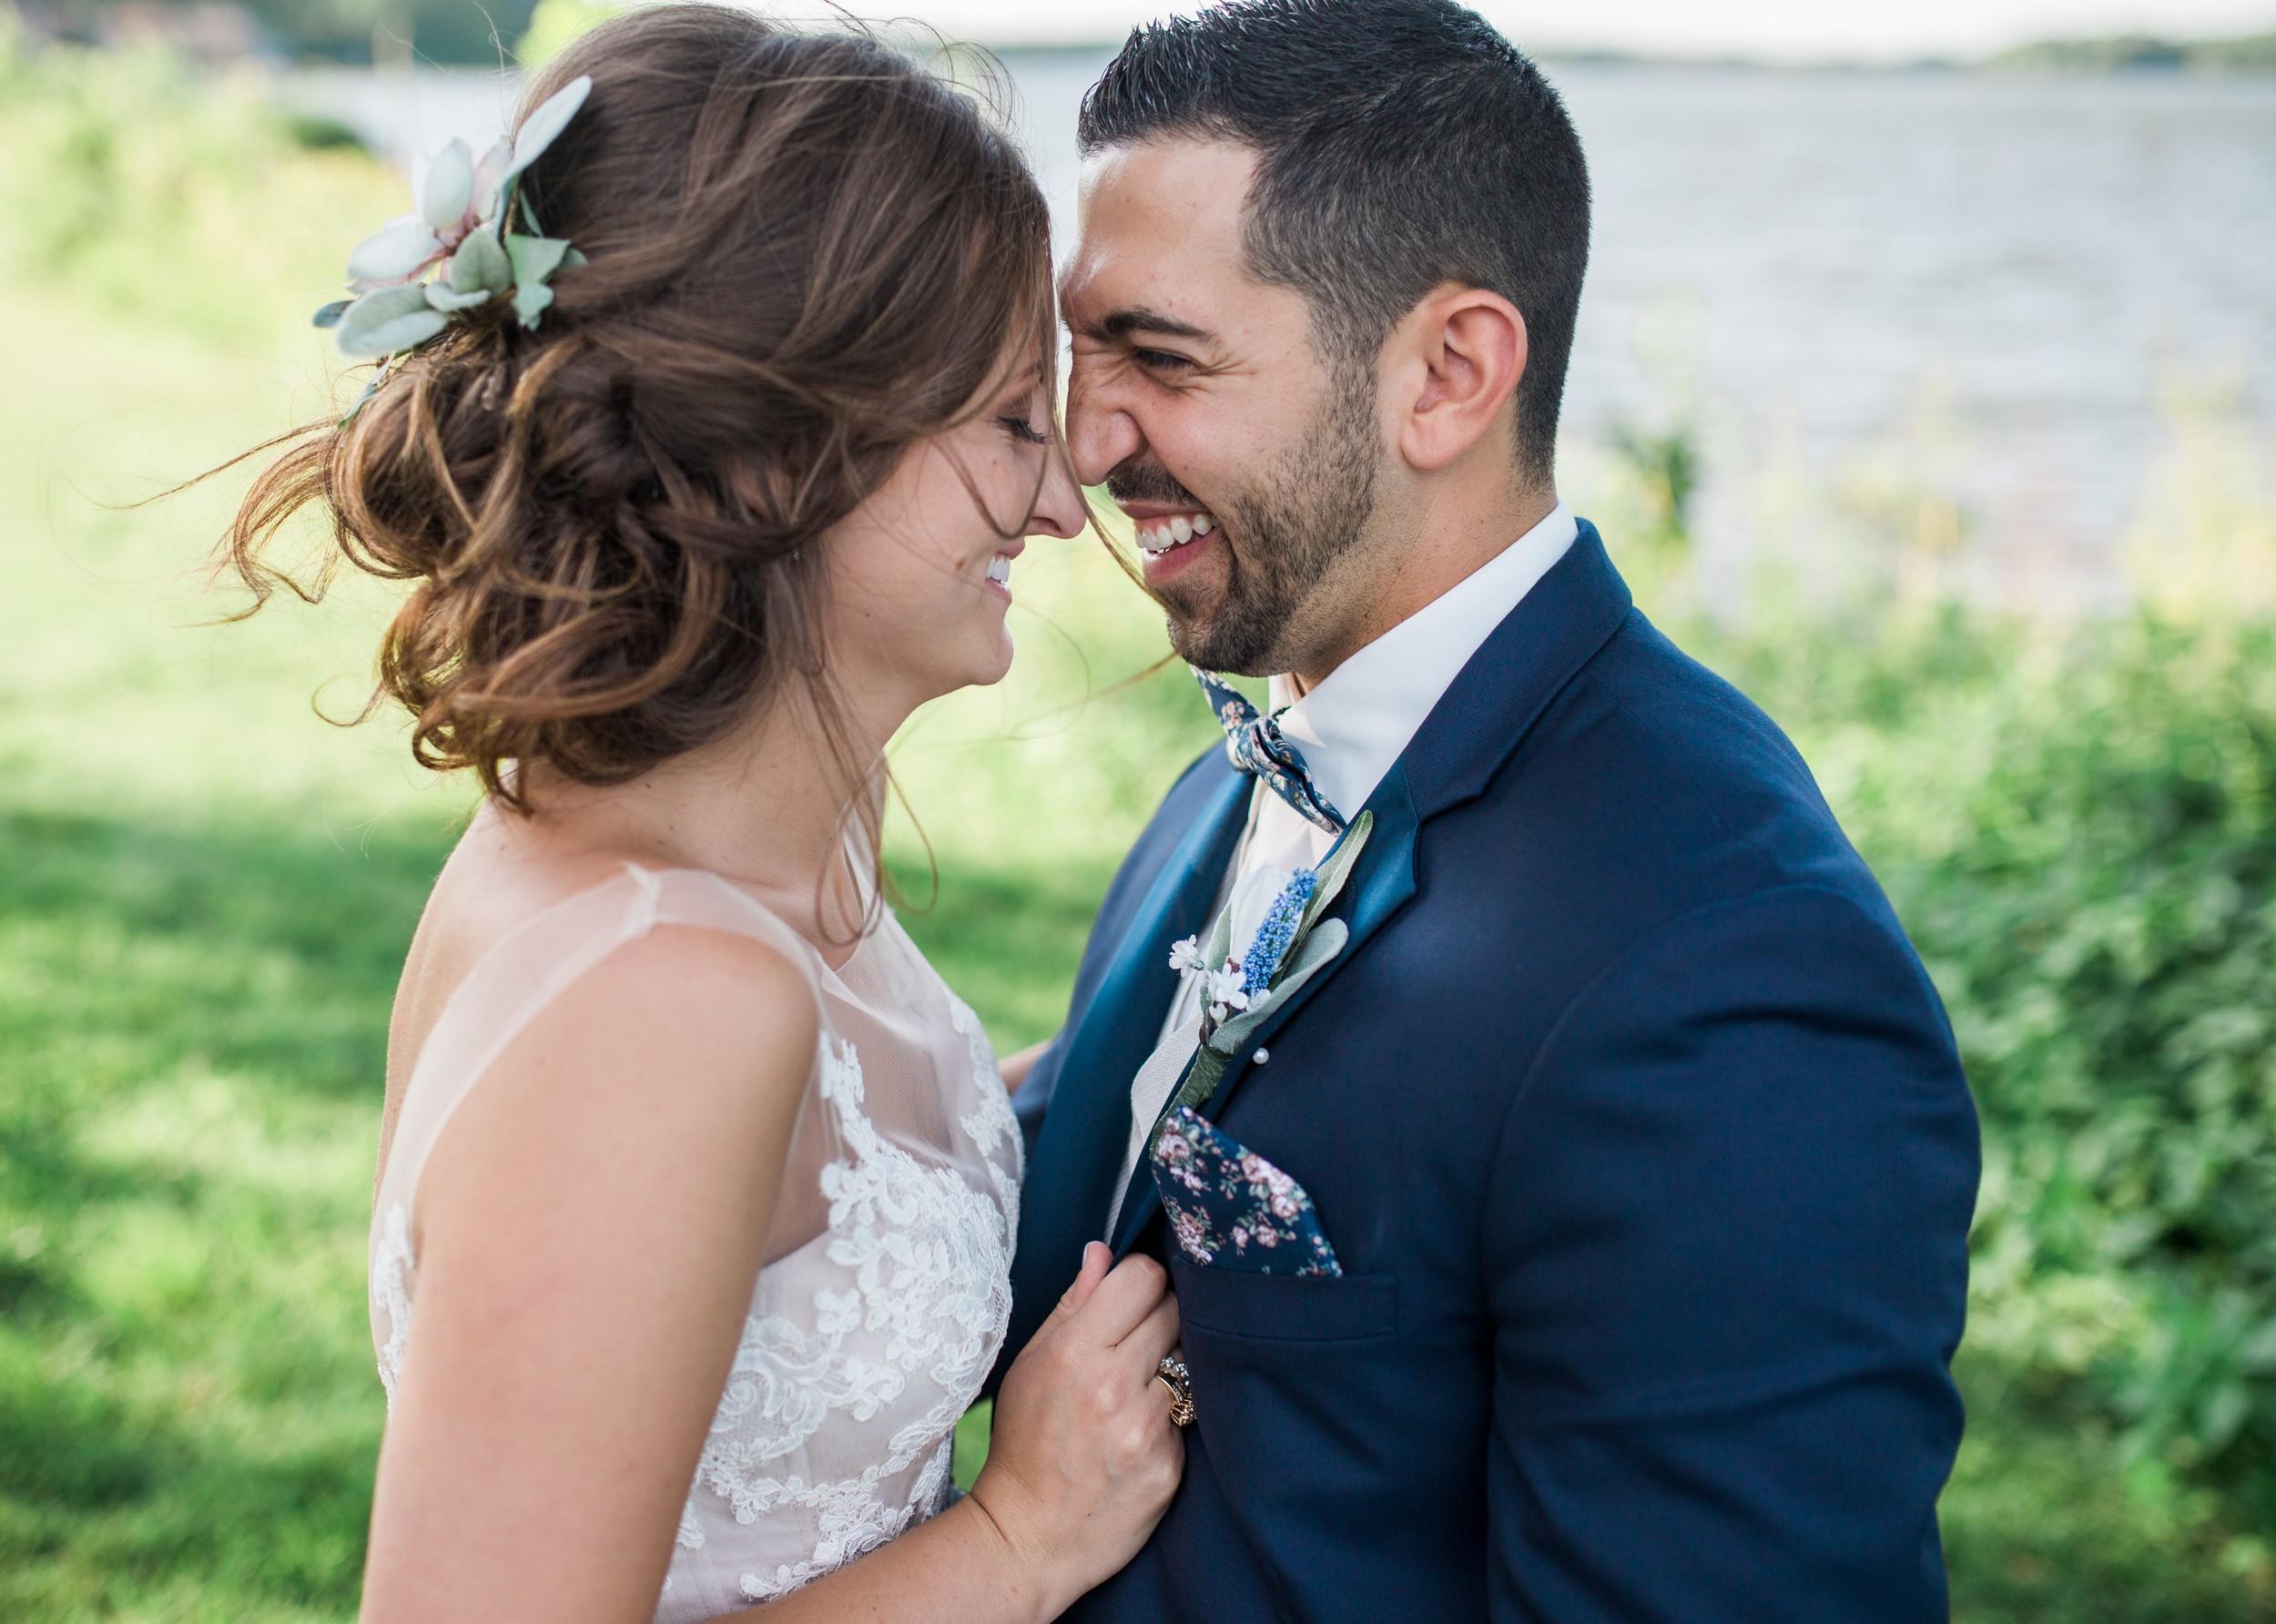 Nick-and-martina-pinelake-vinyards-wedding-columbiana-ohio-tracylynn-photography 30.jpg